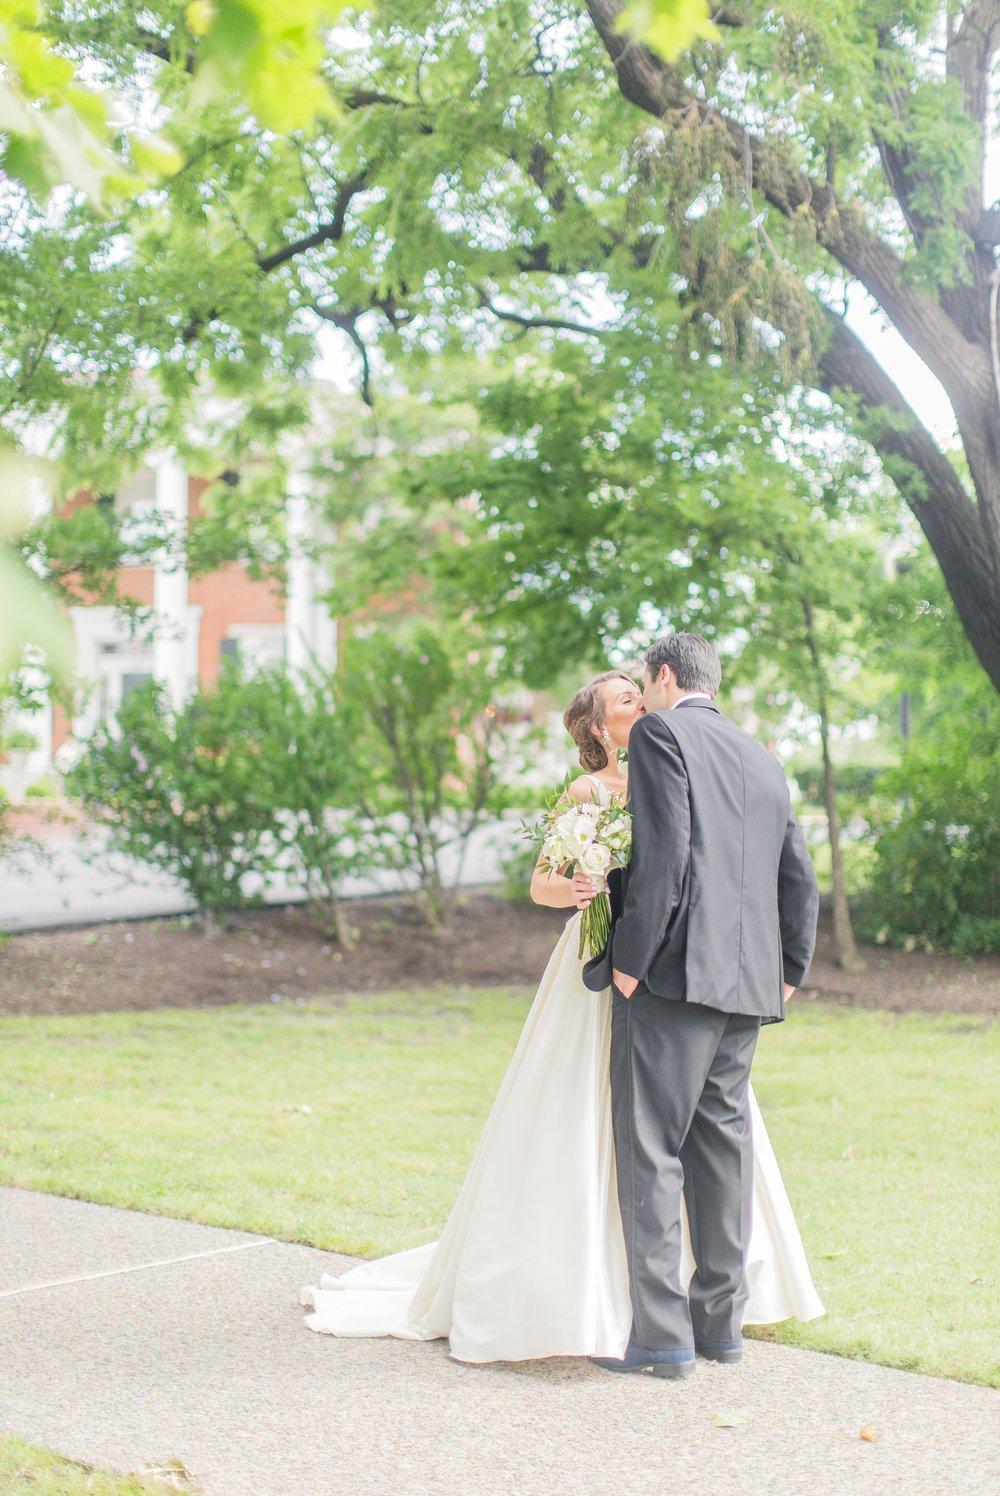 memphis-wedding-hunt-phelan 19.jpg